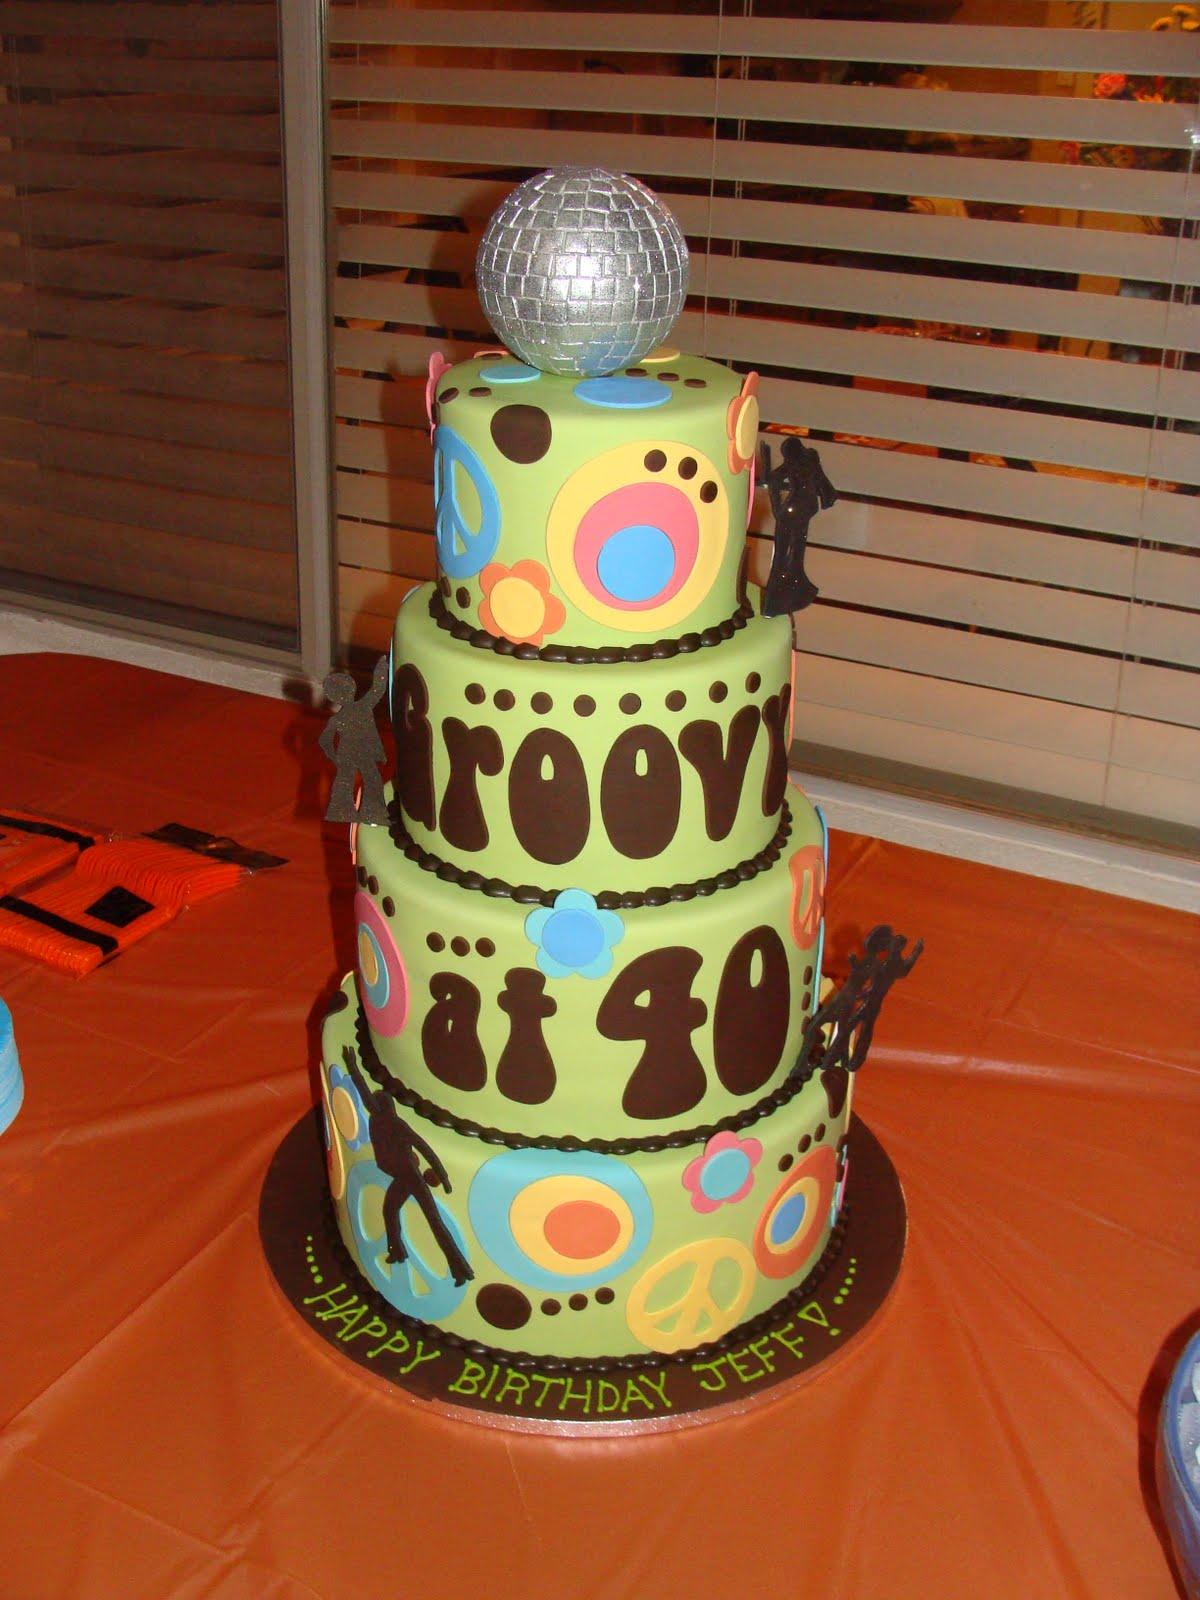 Strong Armor: 70's Cake